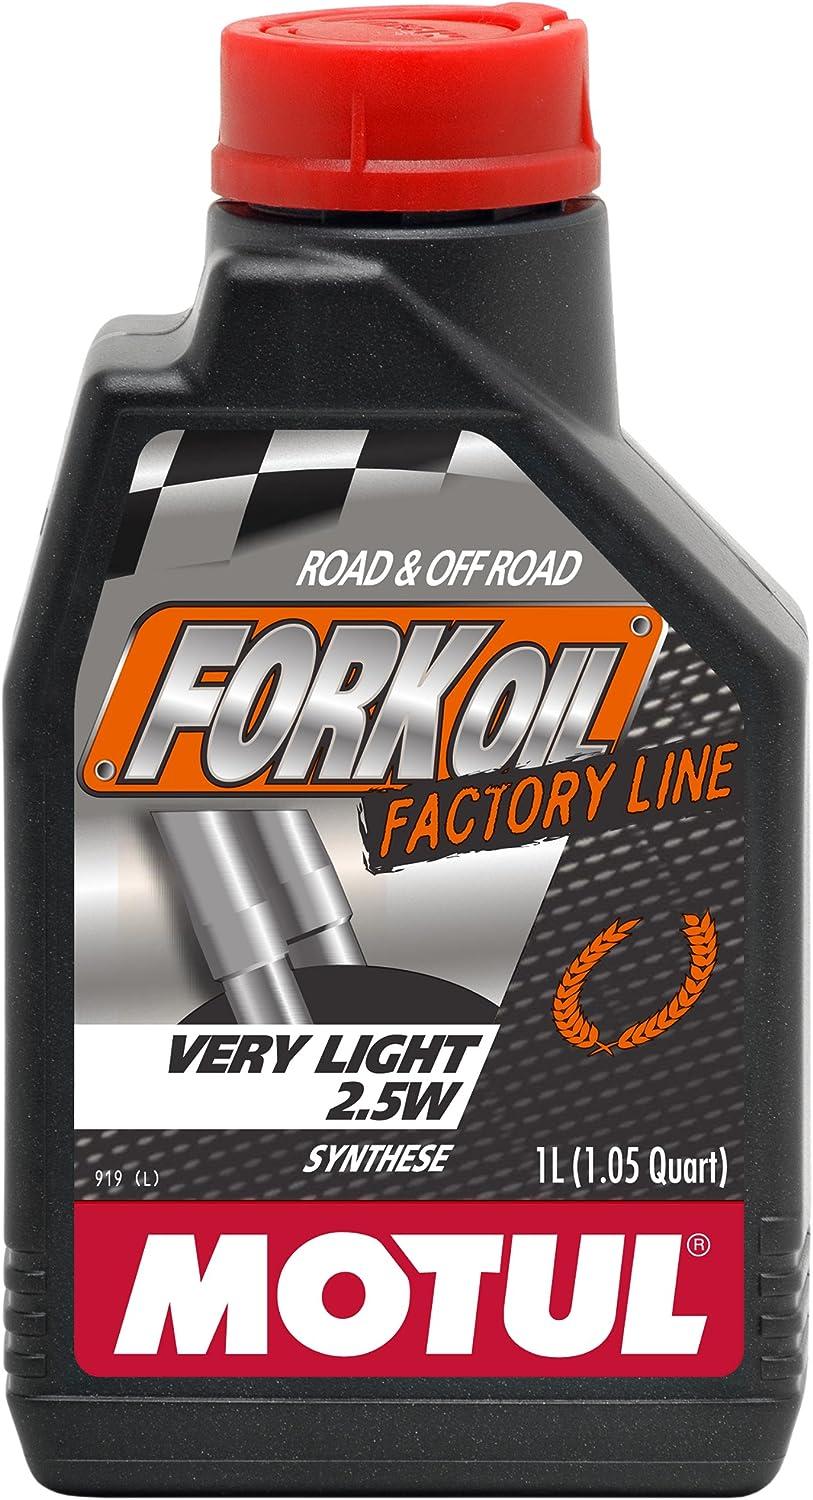 Motul 101133 Very Light Fork Oil Factory Line Auto